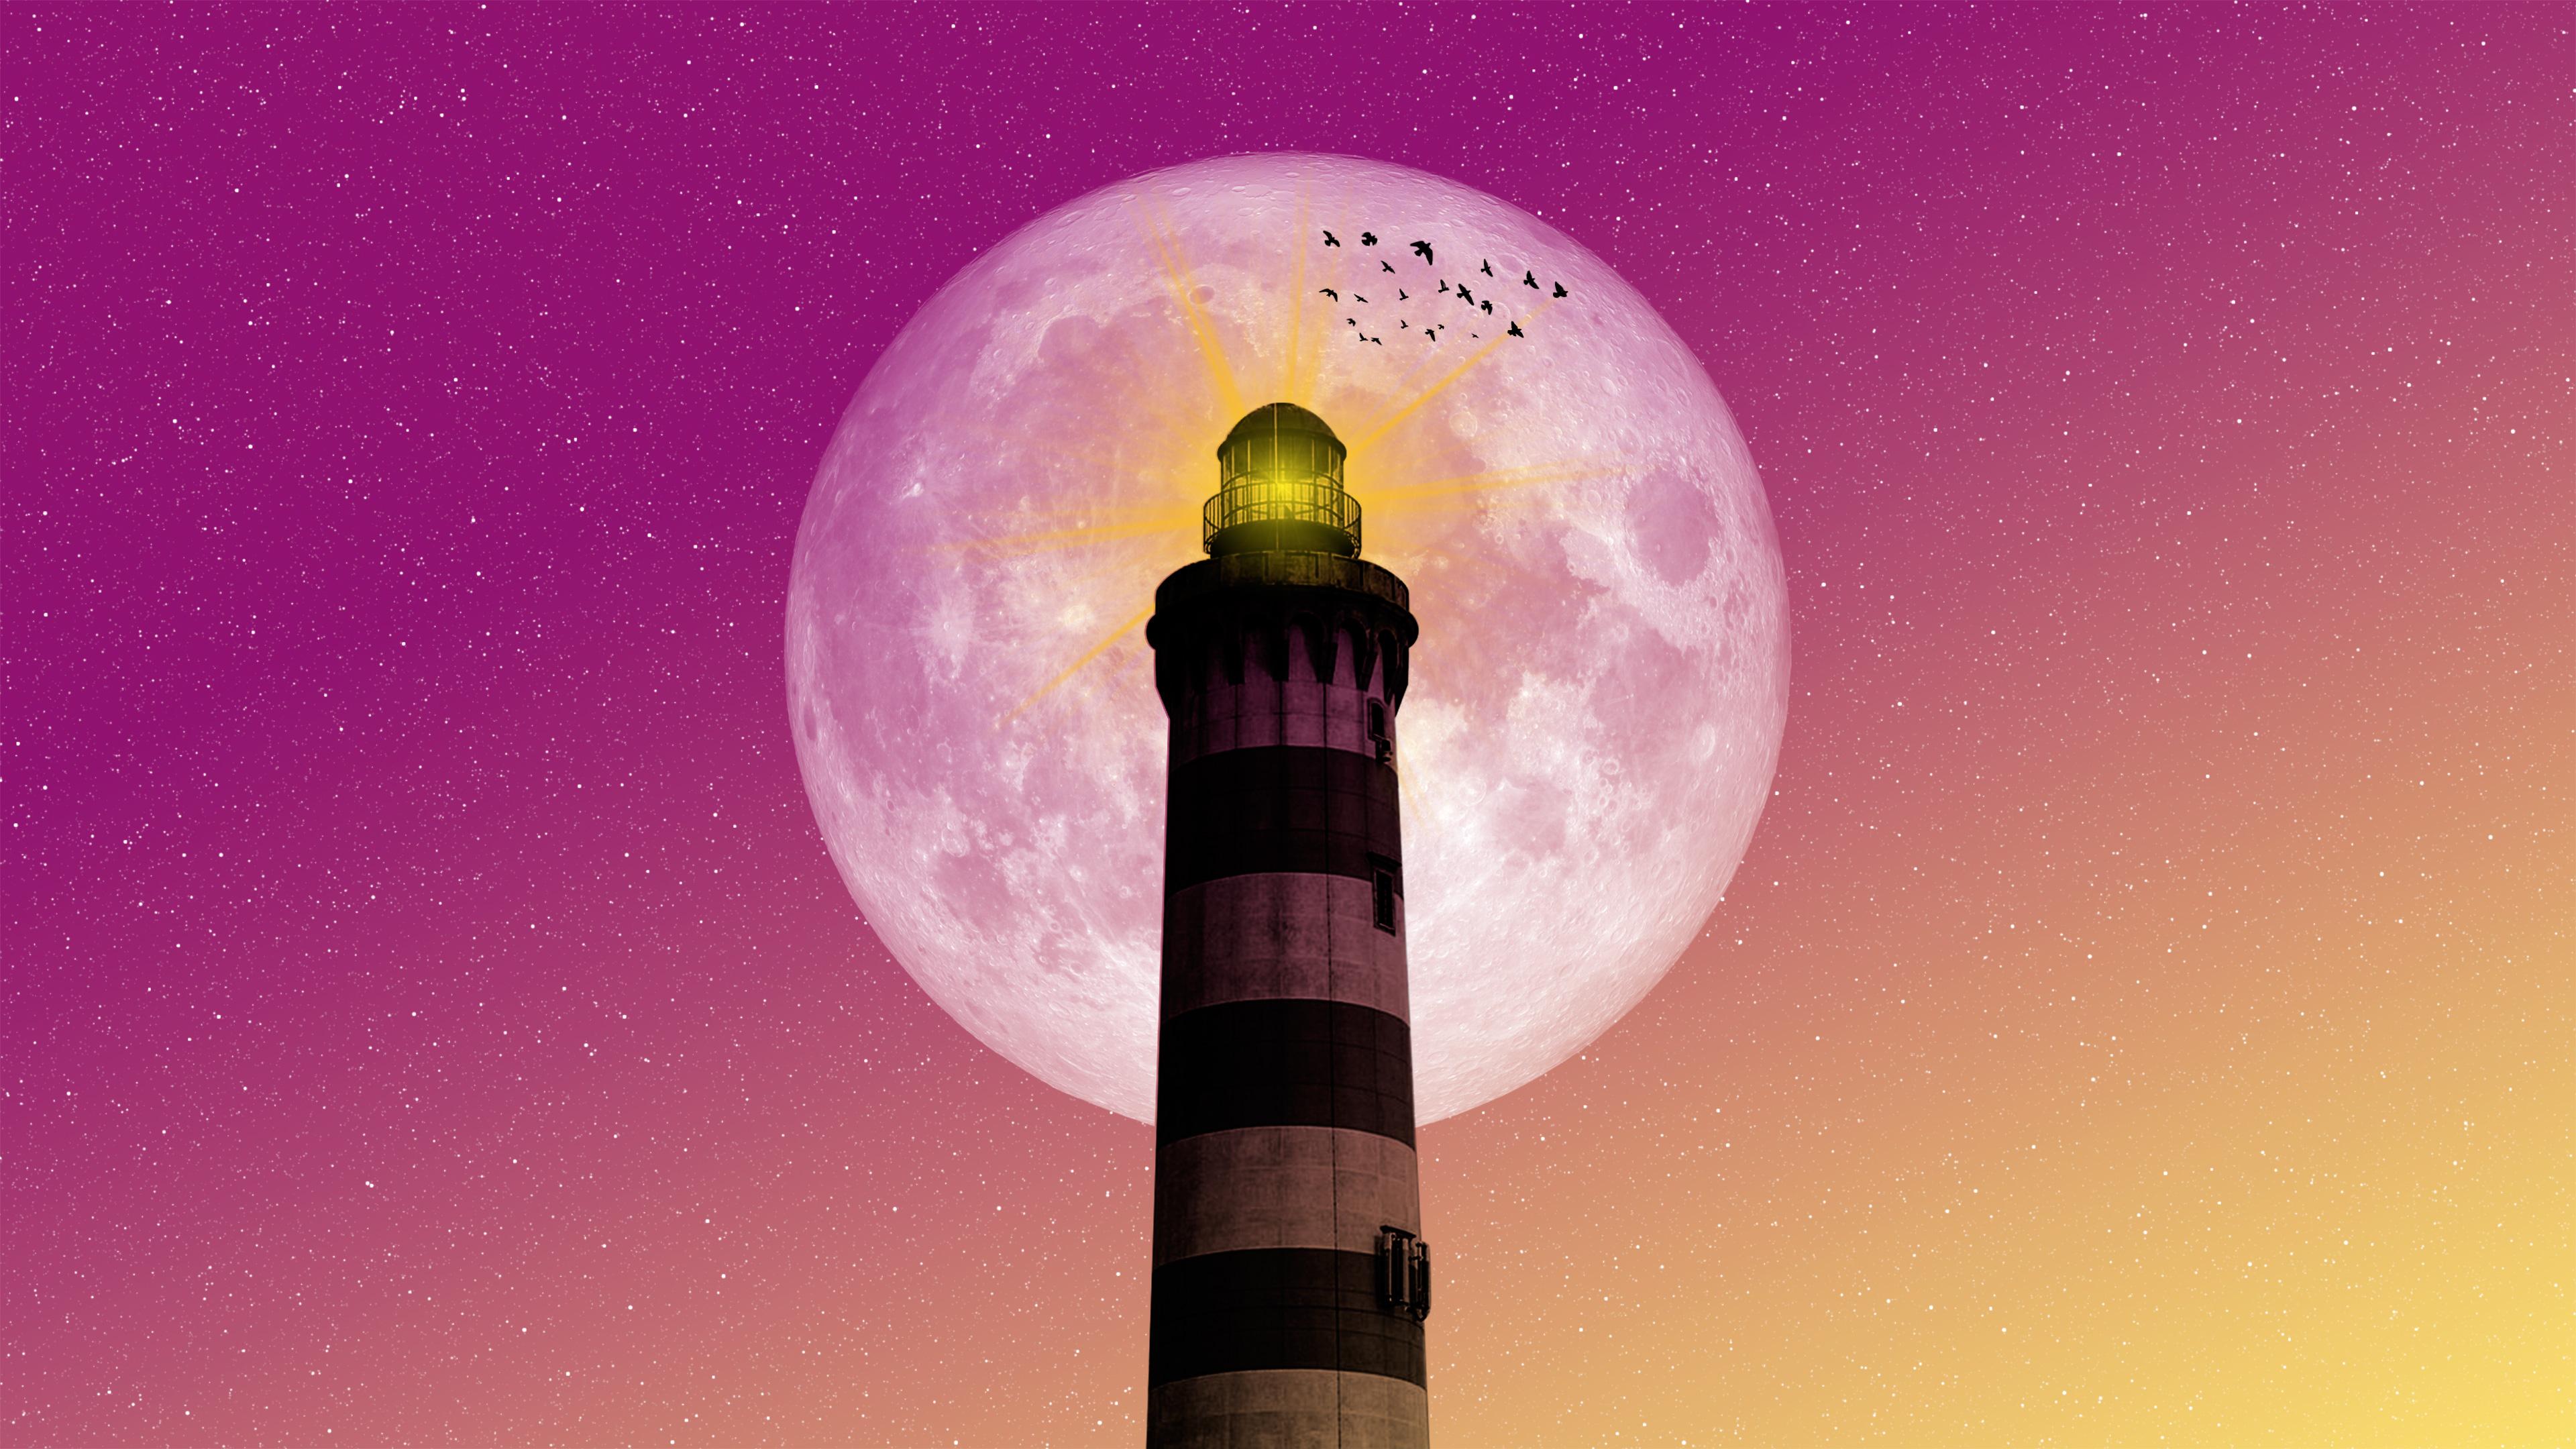 moon lighthouse birds pink yellow sky 1540755058 - Moon Lighthouse Birds Pink Yellow Sky - hd-wallpapers, digital art wallpapers, artwork wallpapers, artist wallpapers, 4k-wallpapers